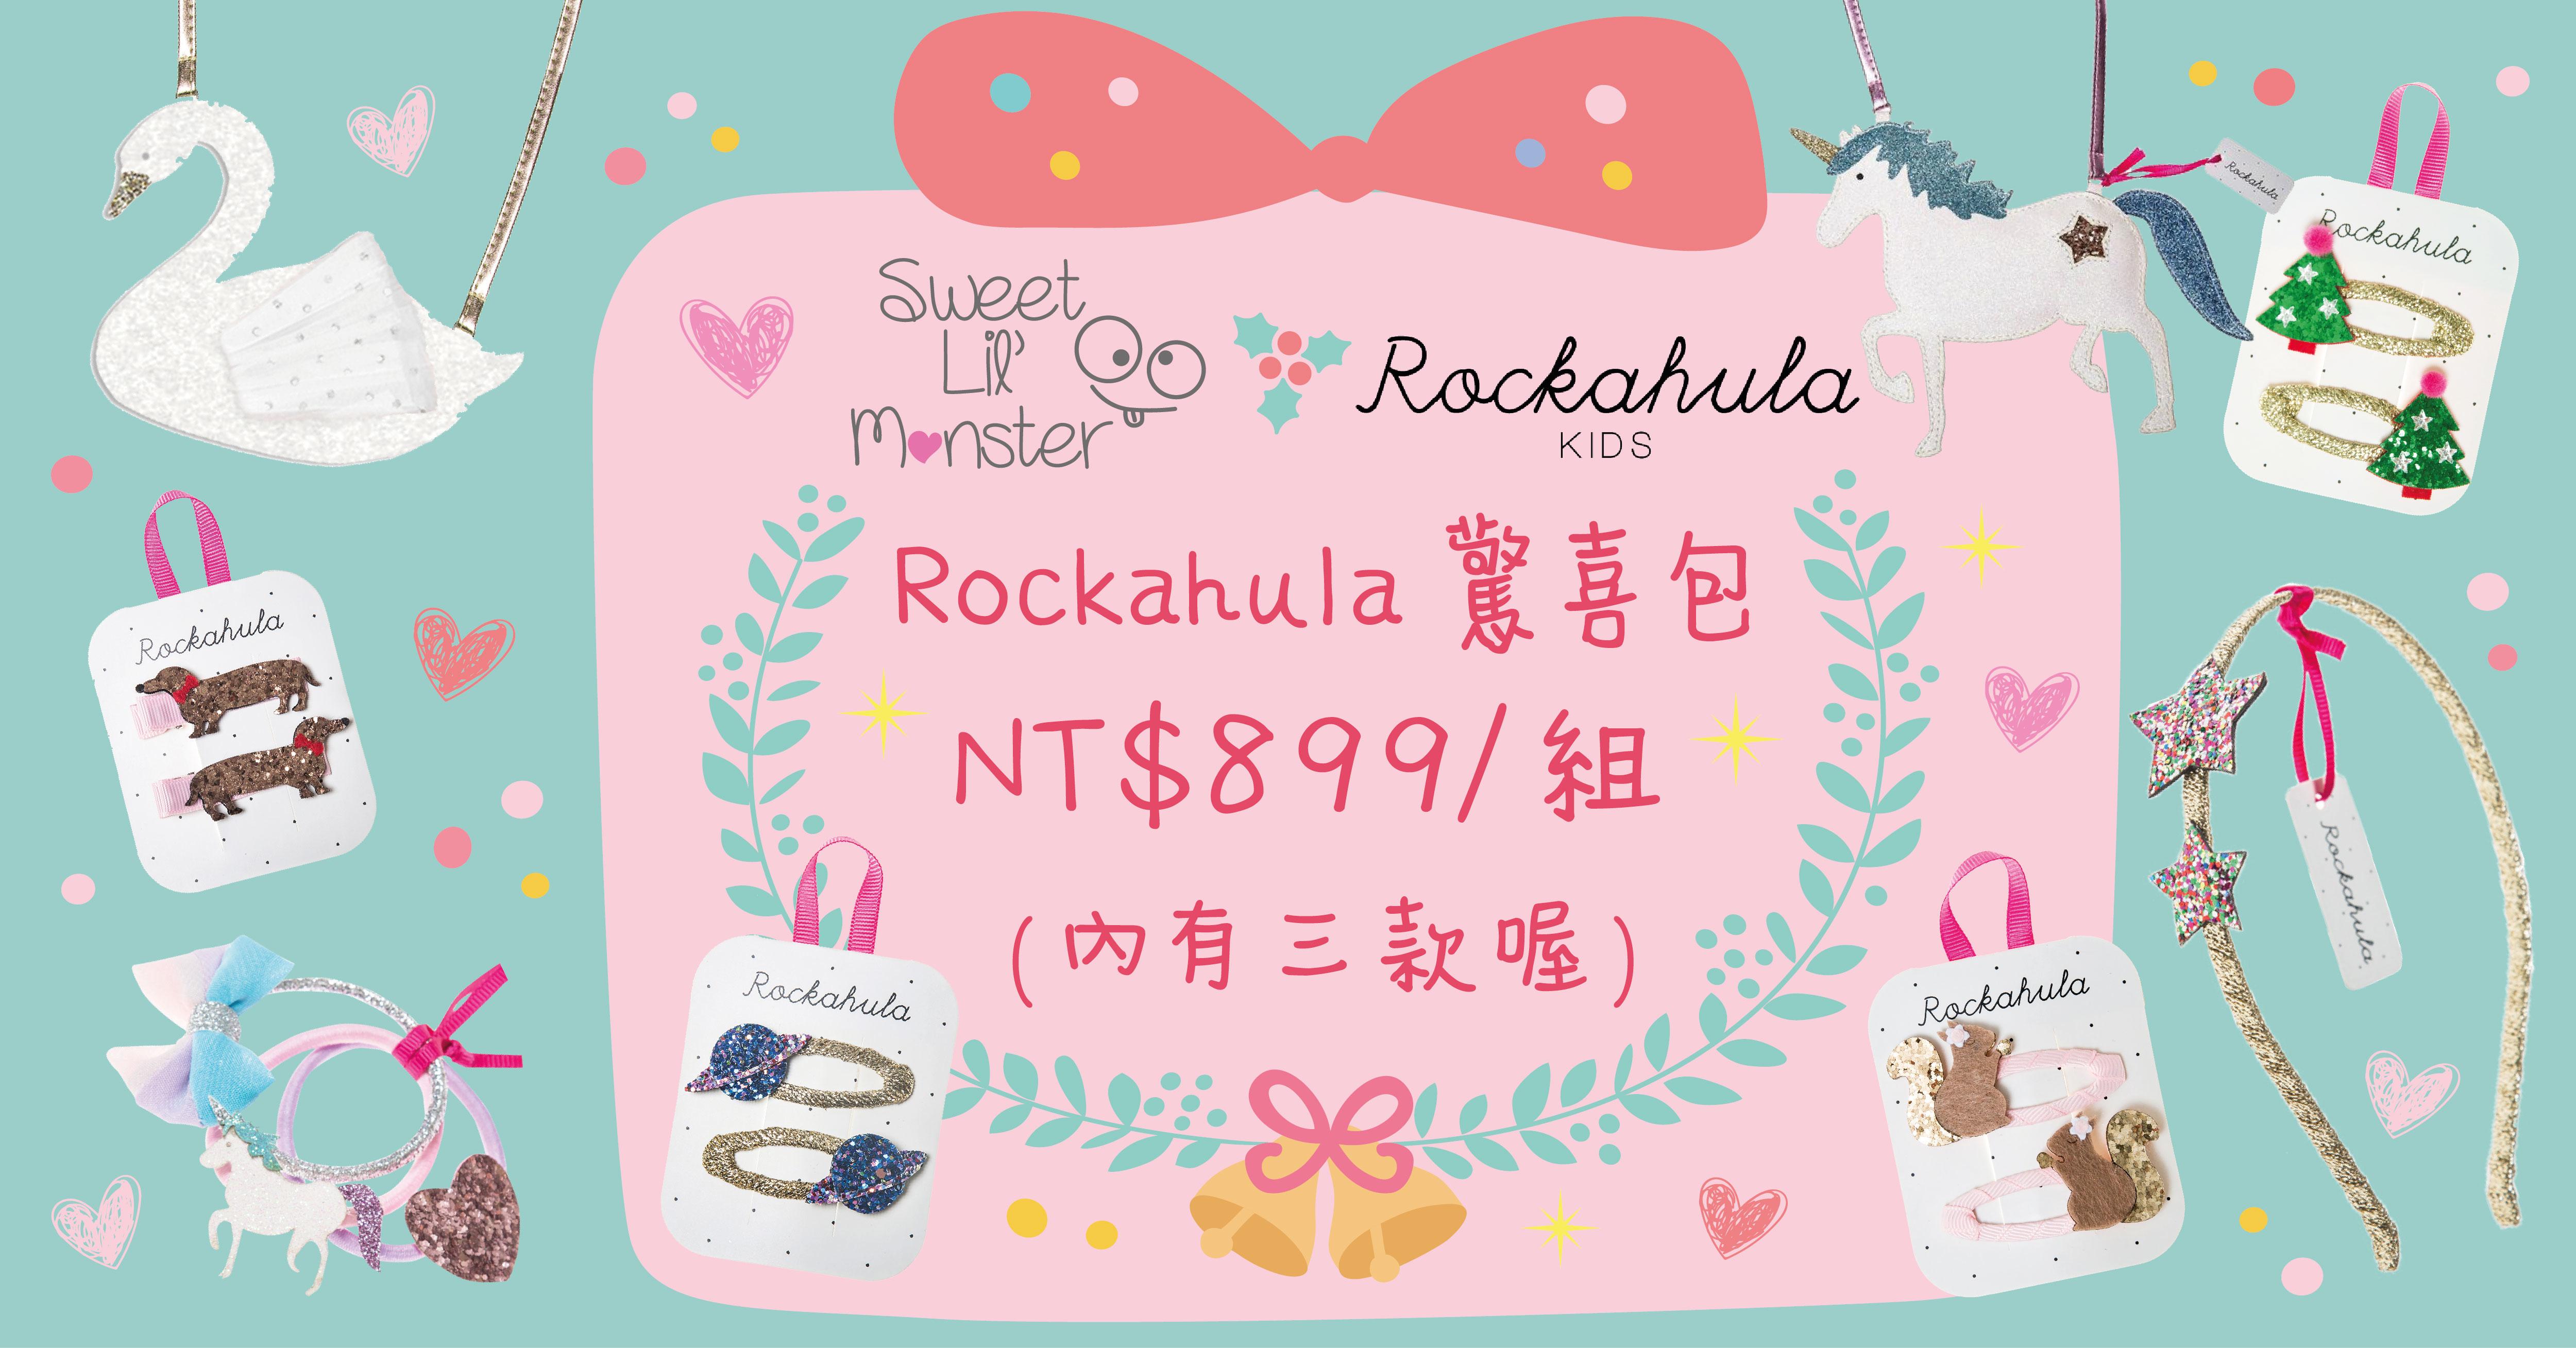 rockahula, 髮飾, 飾品, 髮夾, accessory, hairclip, hairaccessory